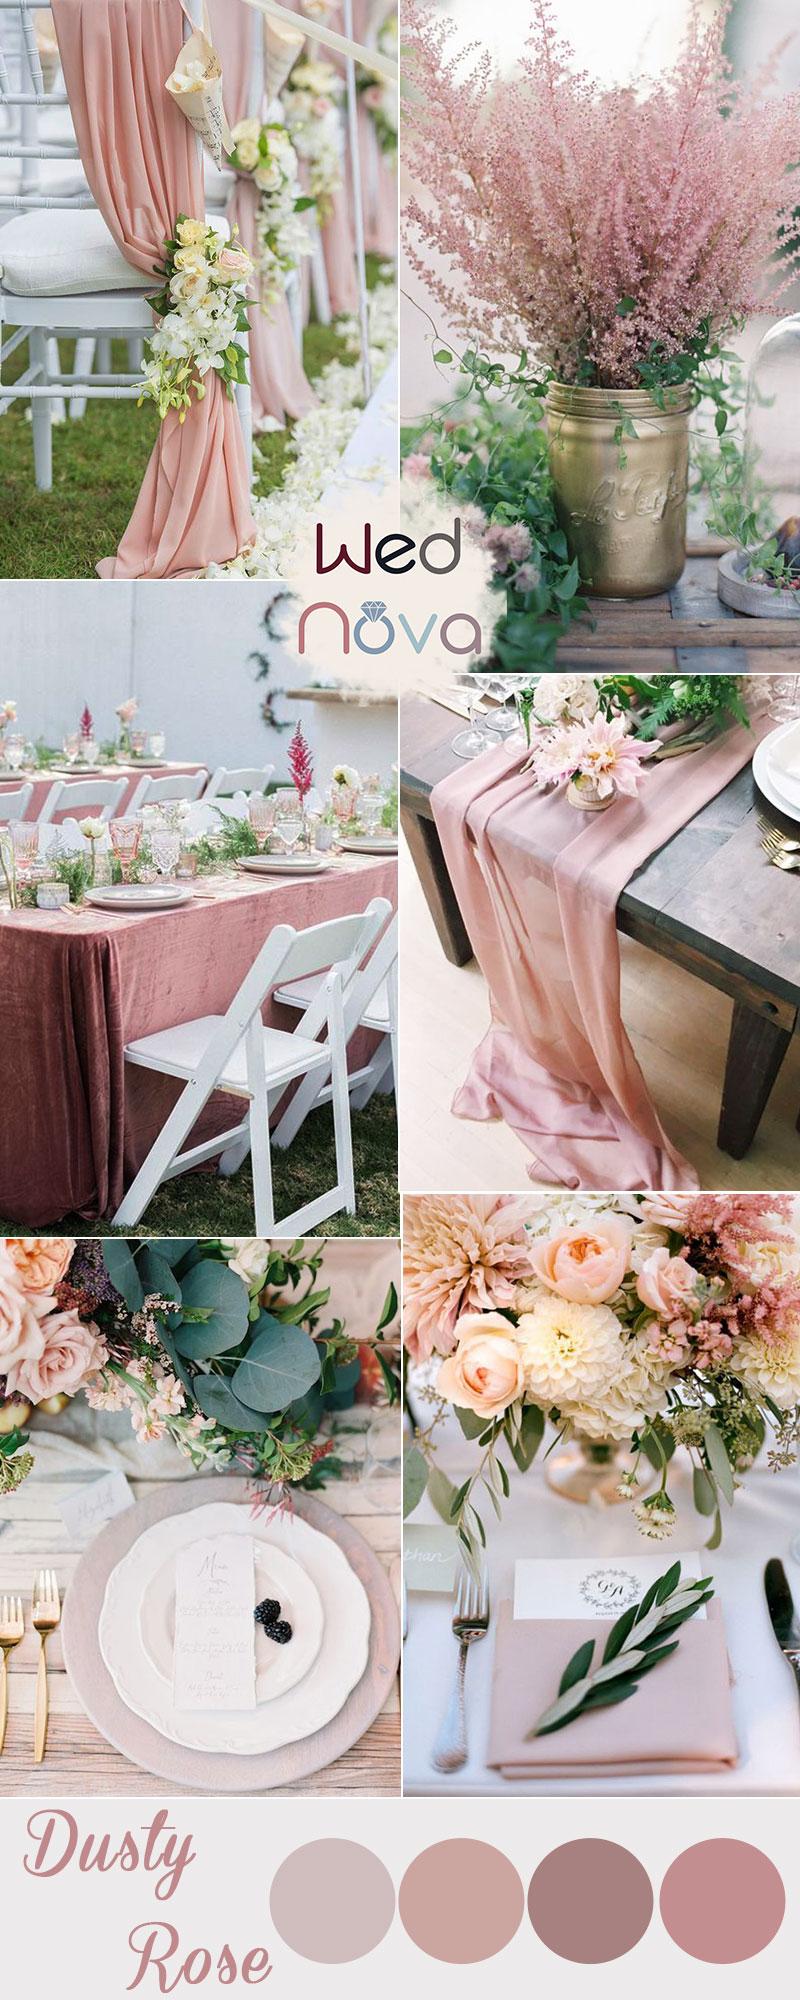 30+ Trendy Dusty Rose Wedding Color Ideas You'll Love - WedNova Blog